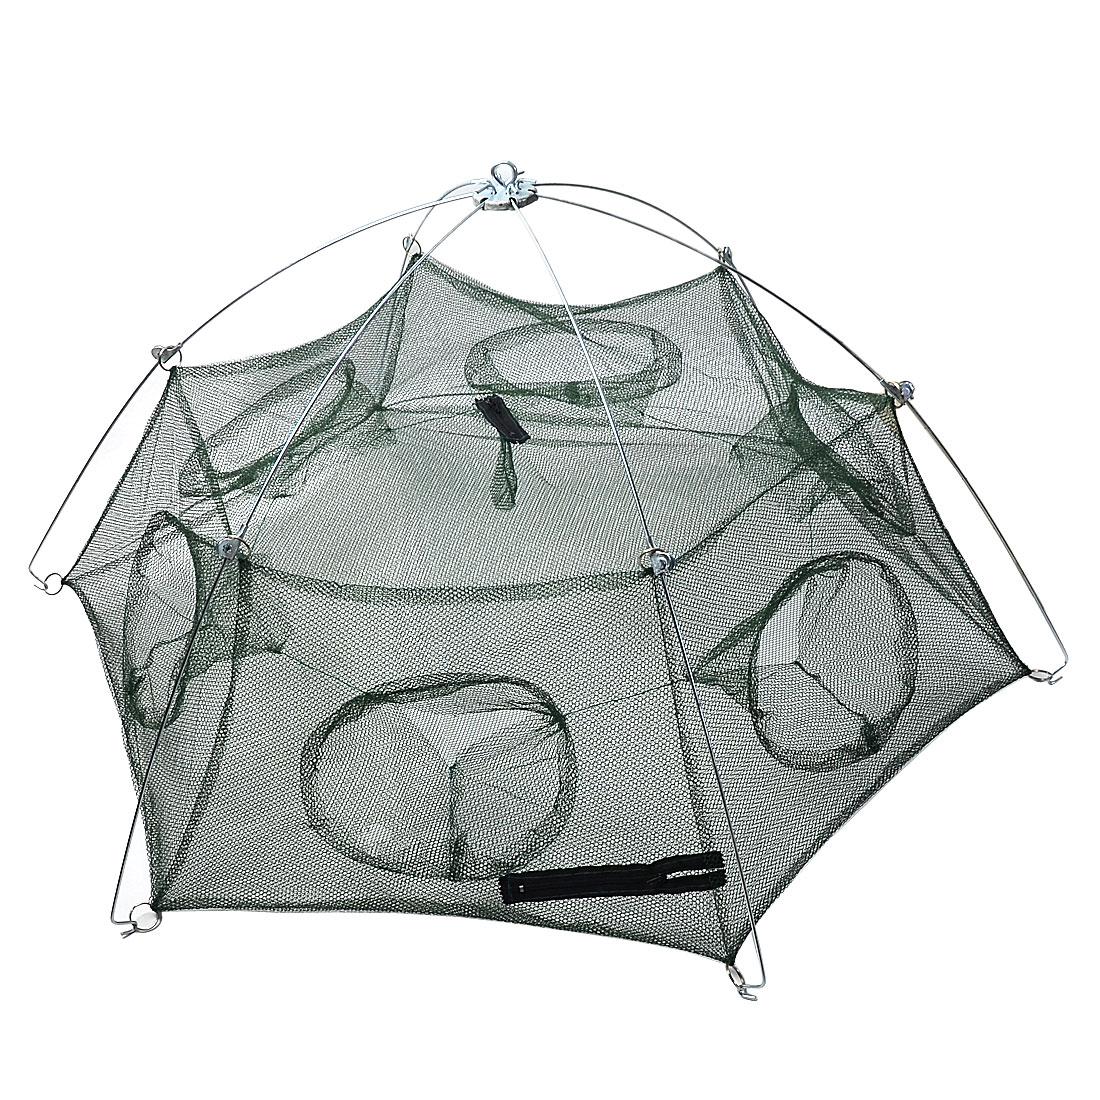 82cm x 100cm x 32cm Metal Frame Fishing Umbrella Shrimp Cast Dip Net Dark Green